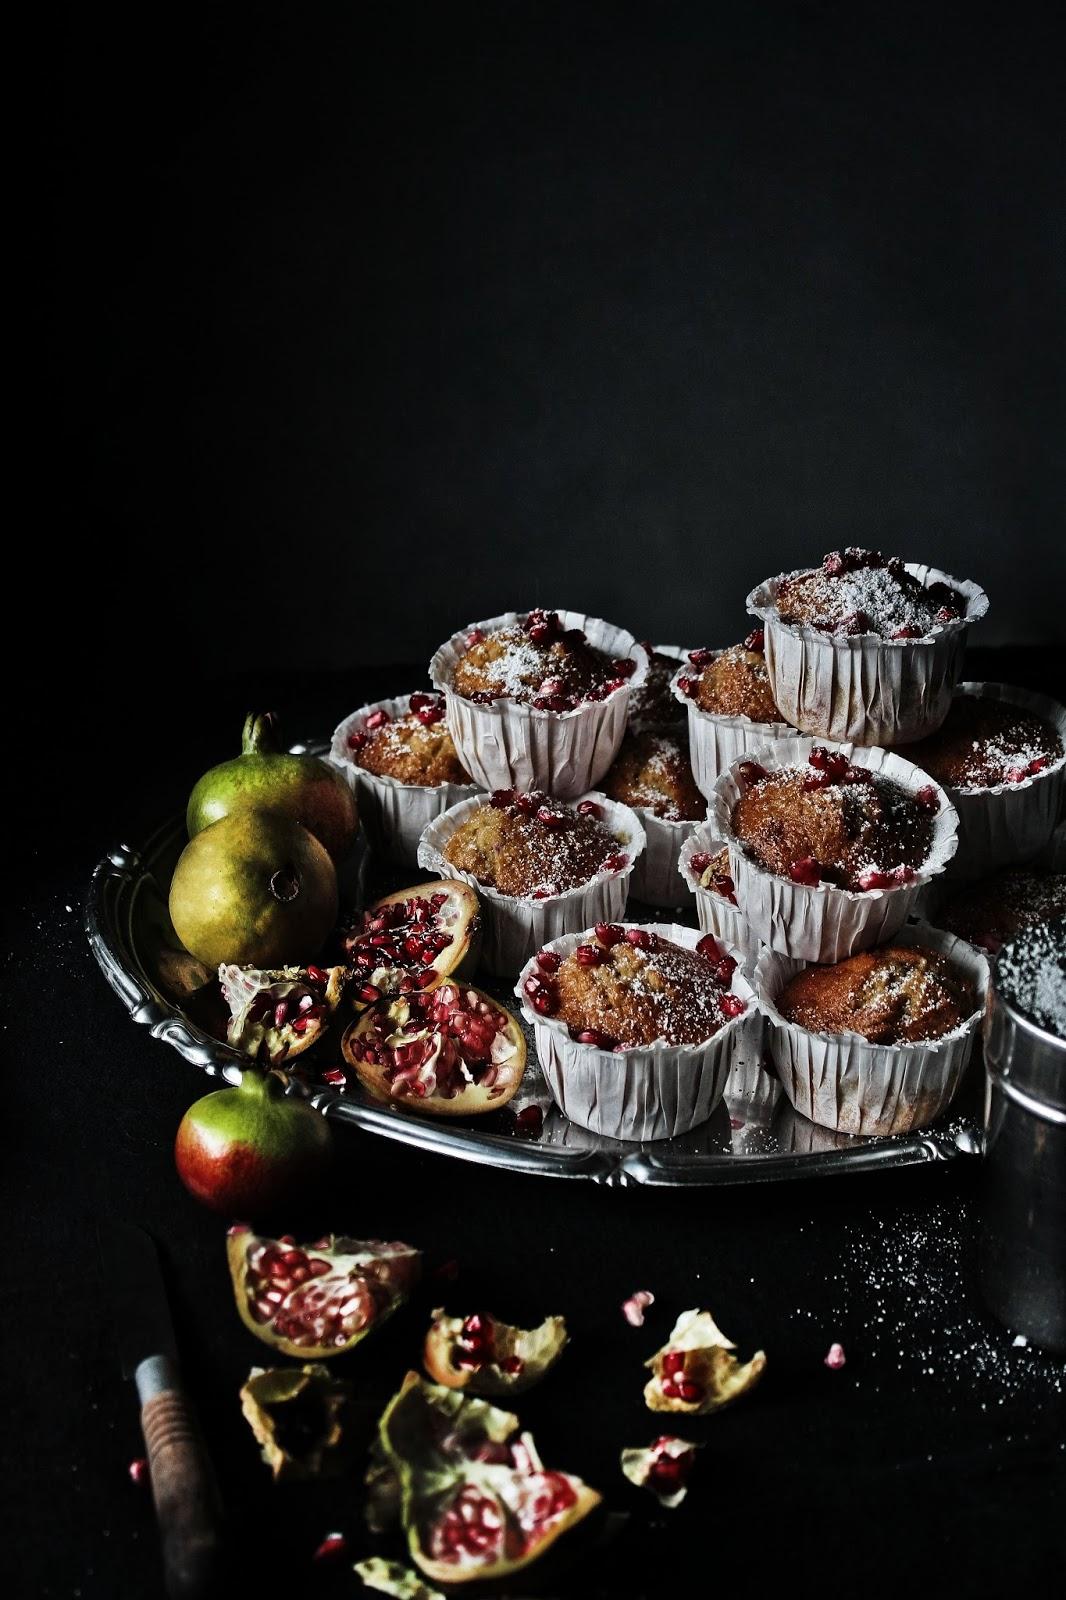 bolos de romã sem glúten   gluten free pomegranate cakes